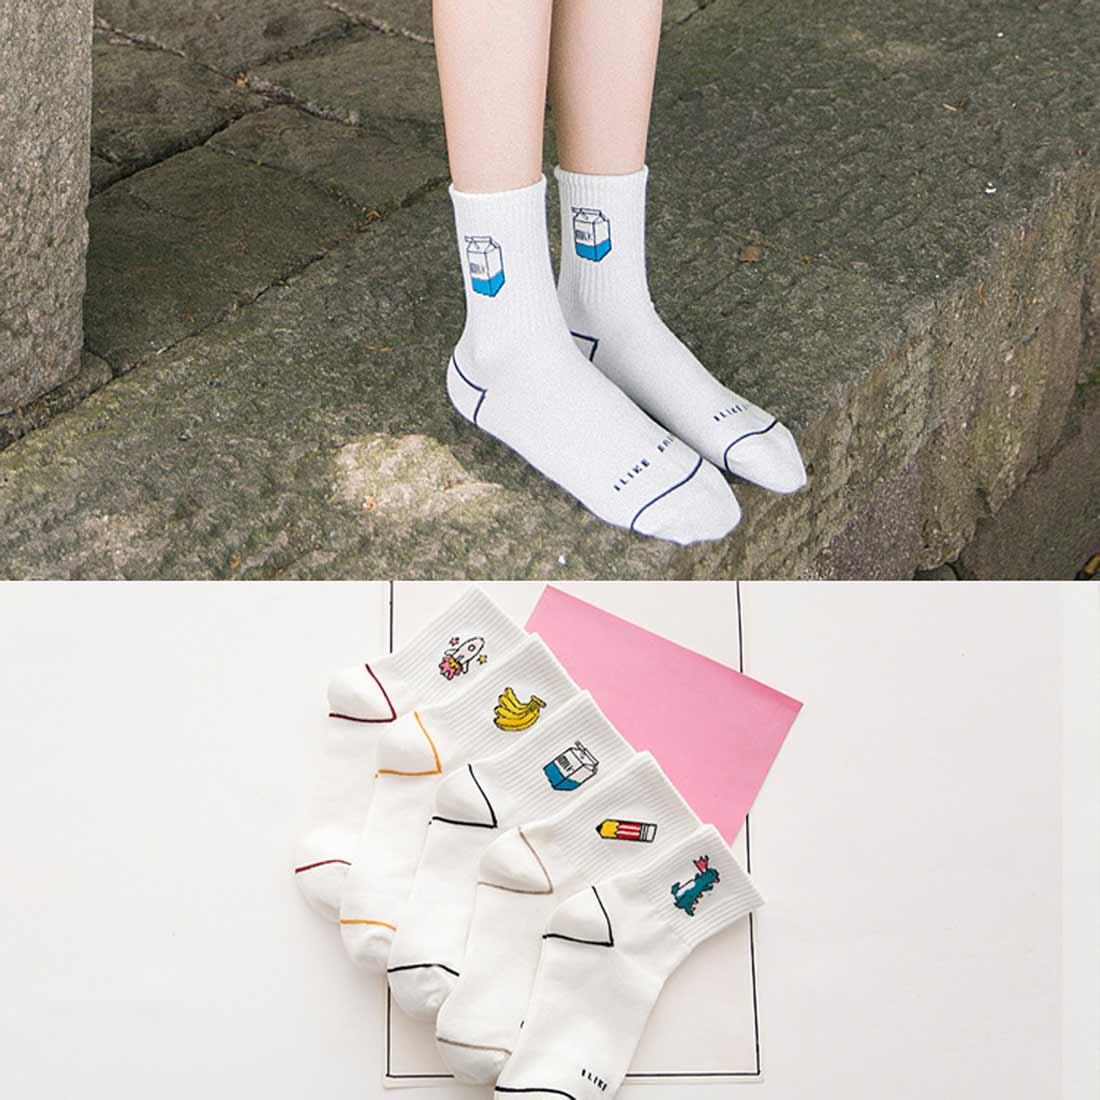 Cute Cartoon Letter Women Socks Milk Banana Rocket Pencil Harajuku Cotton Funny Crew with Gift